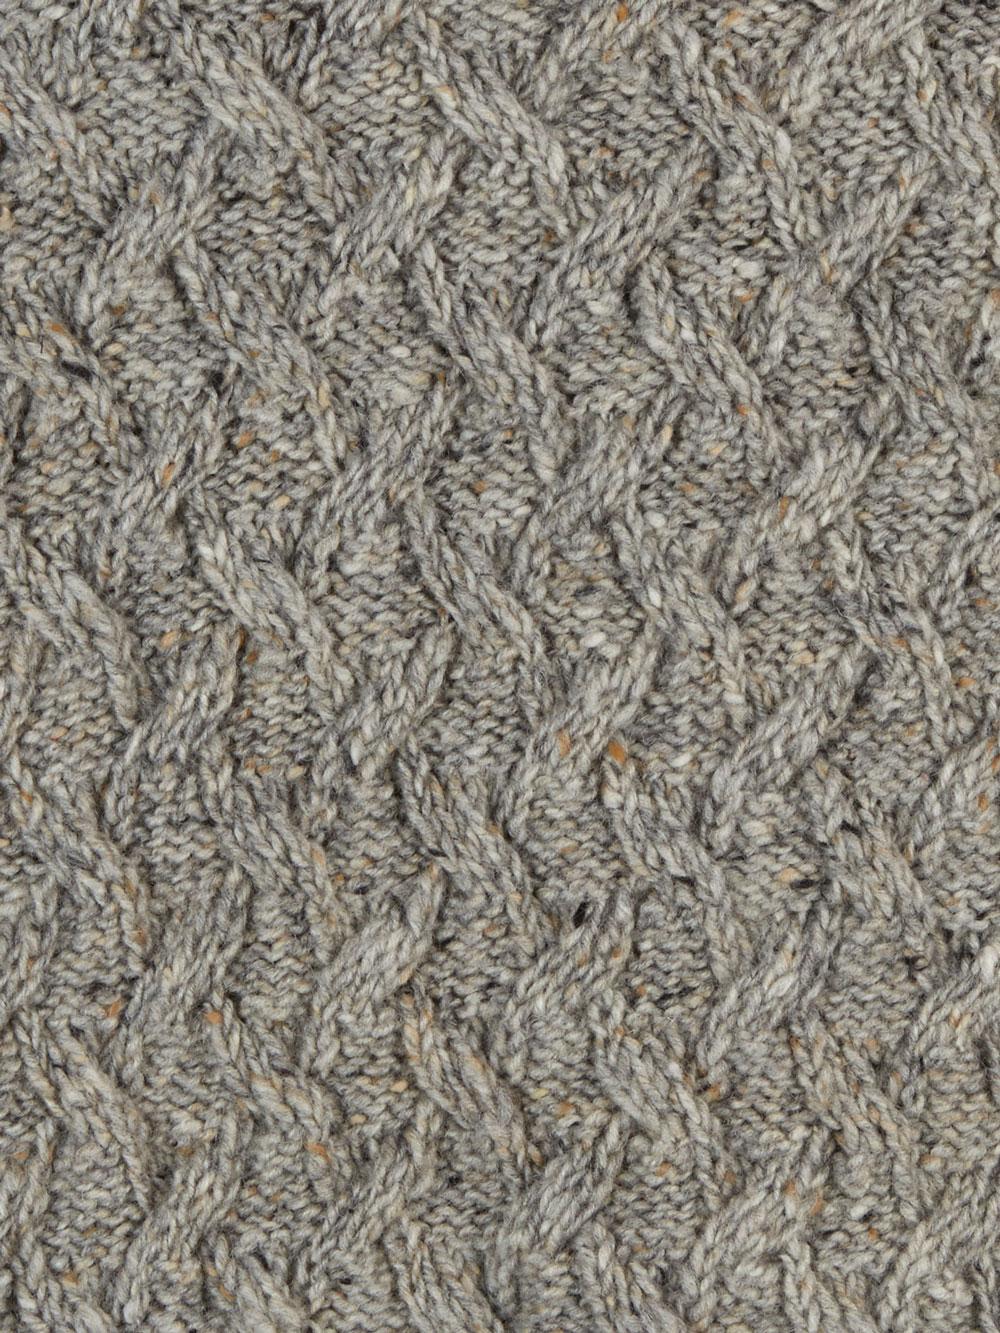 Sweater_M18-14_Achill Aran_5 Variations_Grey_SWATCH_PRO SHOT_WEB RES.jpg